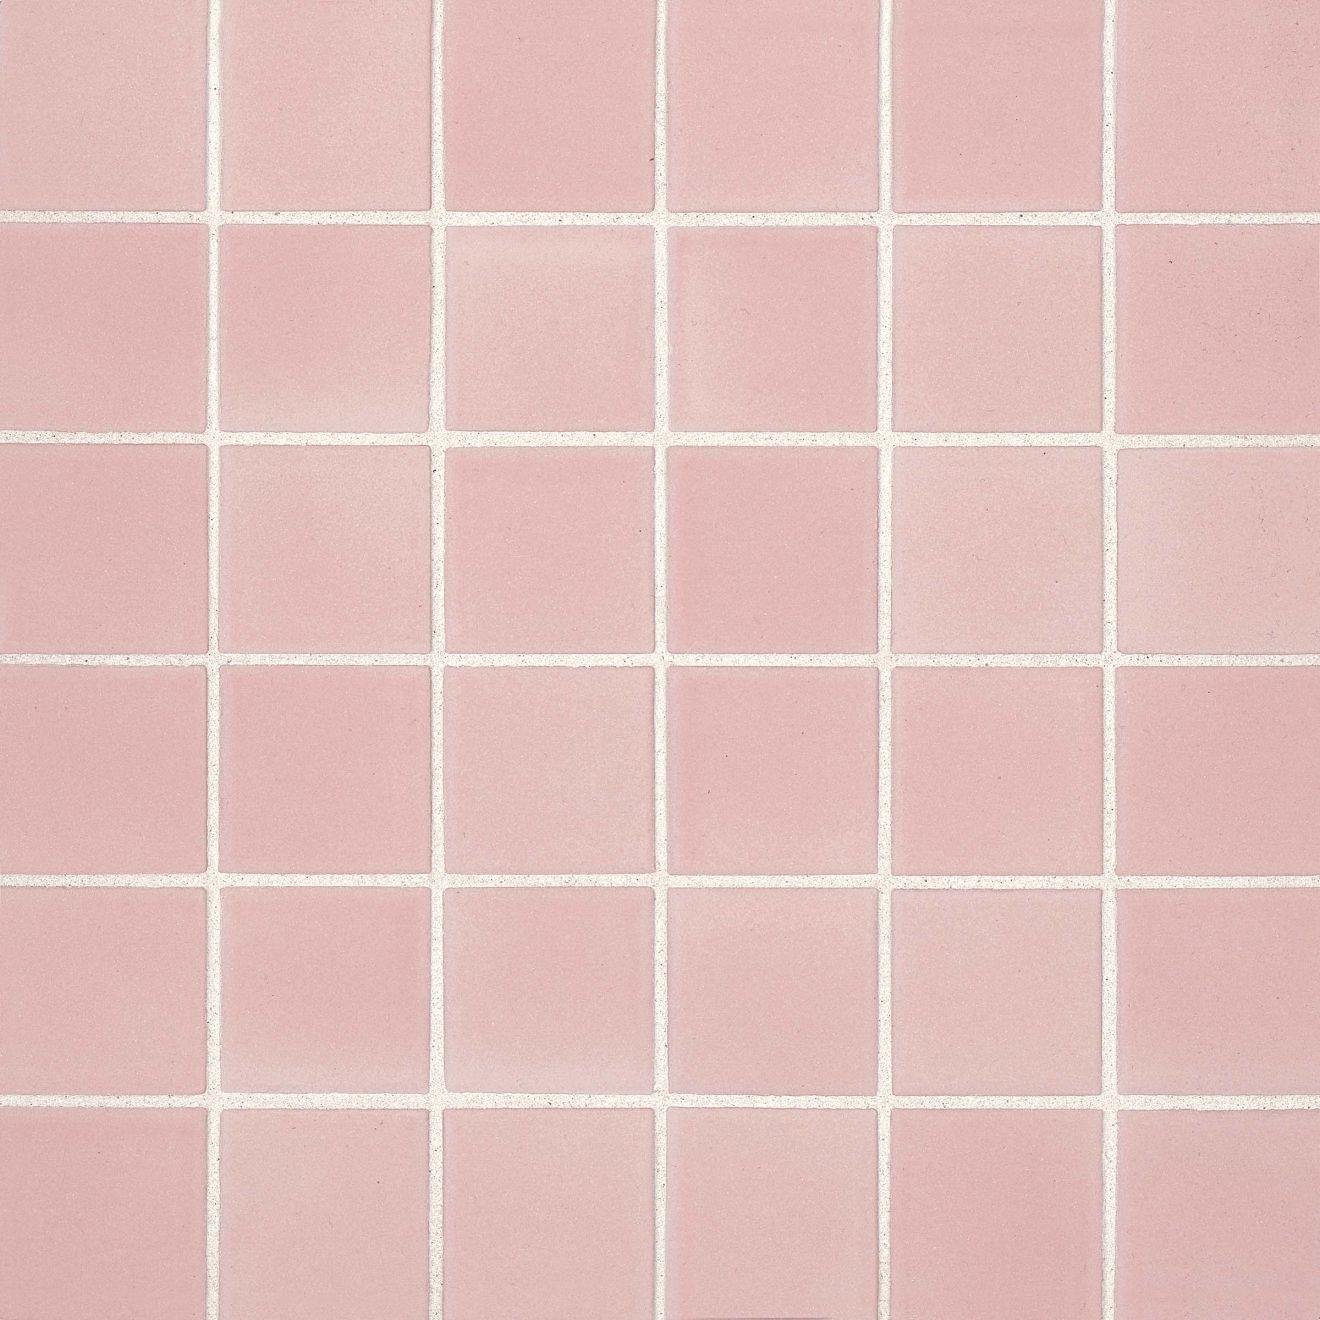 "True 2"" x 2"" Floor & Wall Mosaic in Pink"